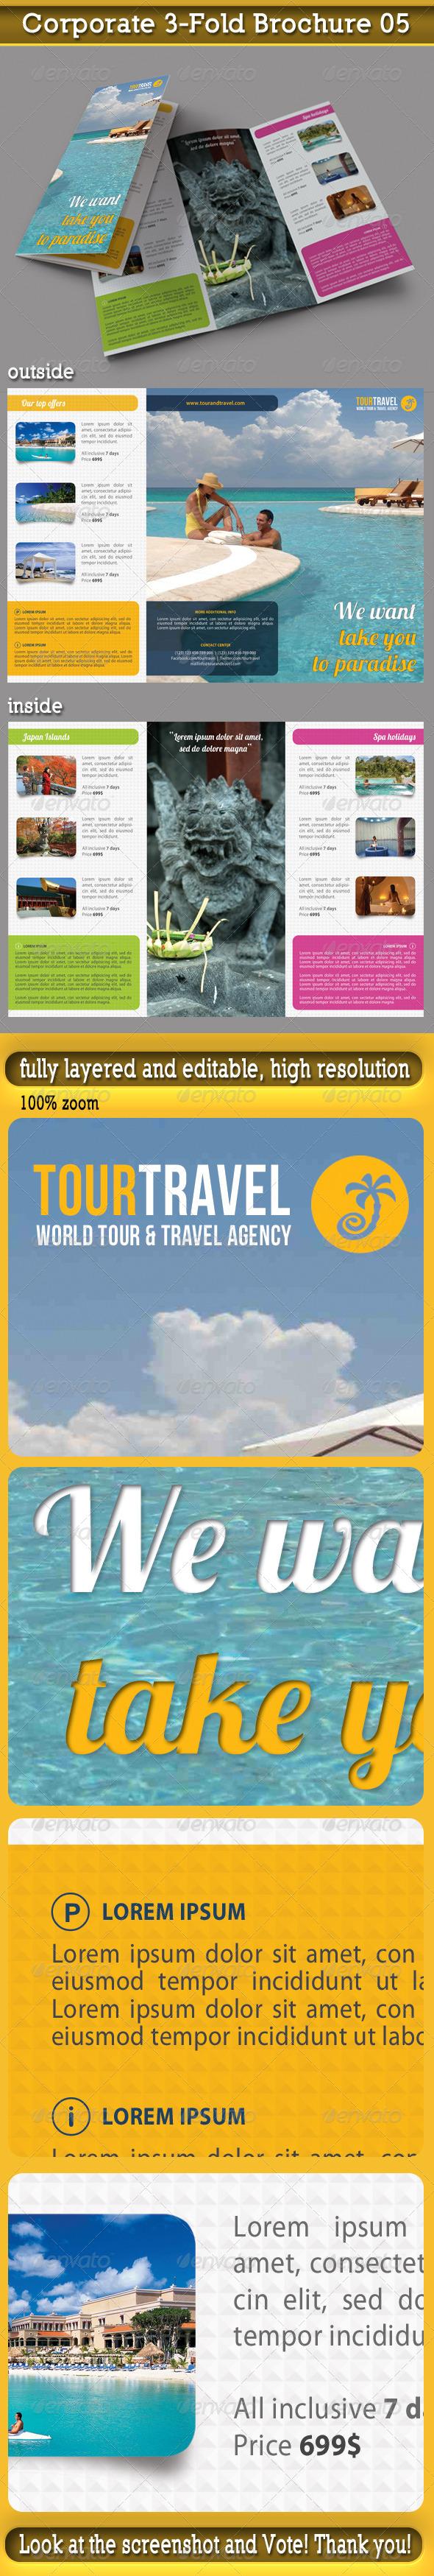 Travel Agency 3-Fold Brochure 03 - Informational Brochures